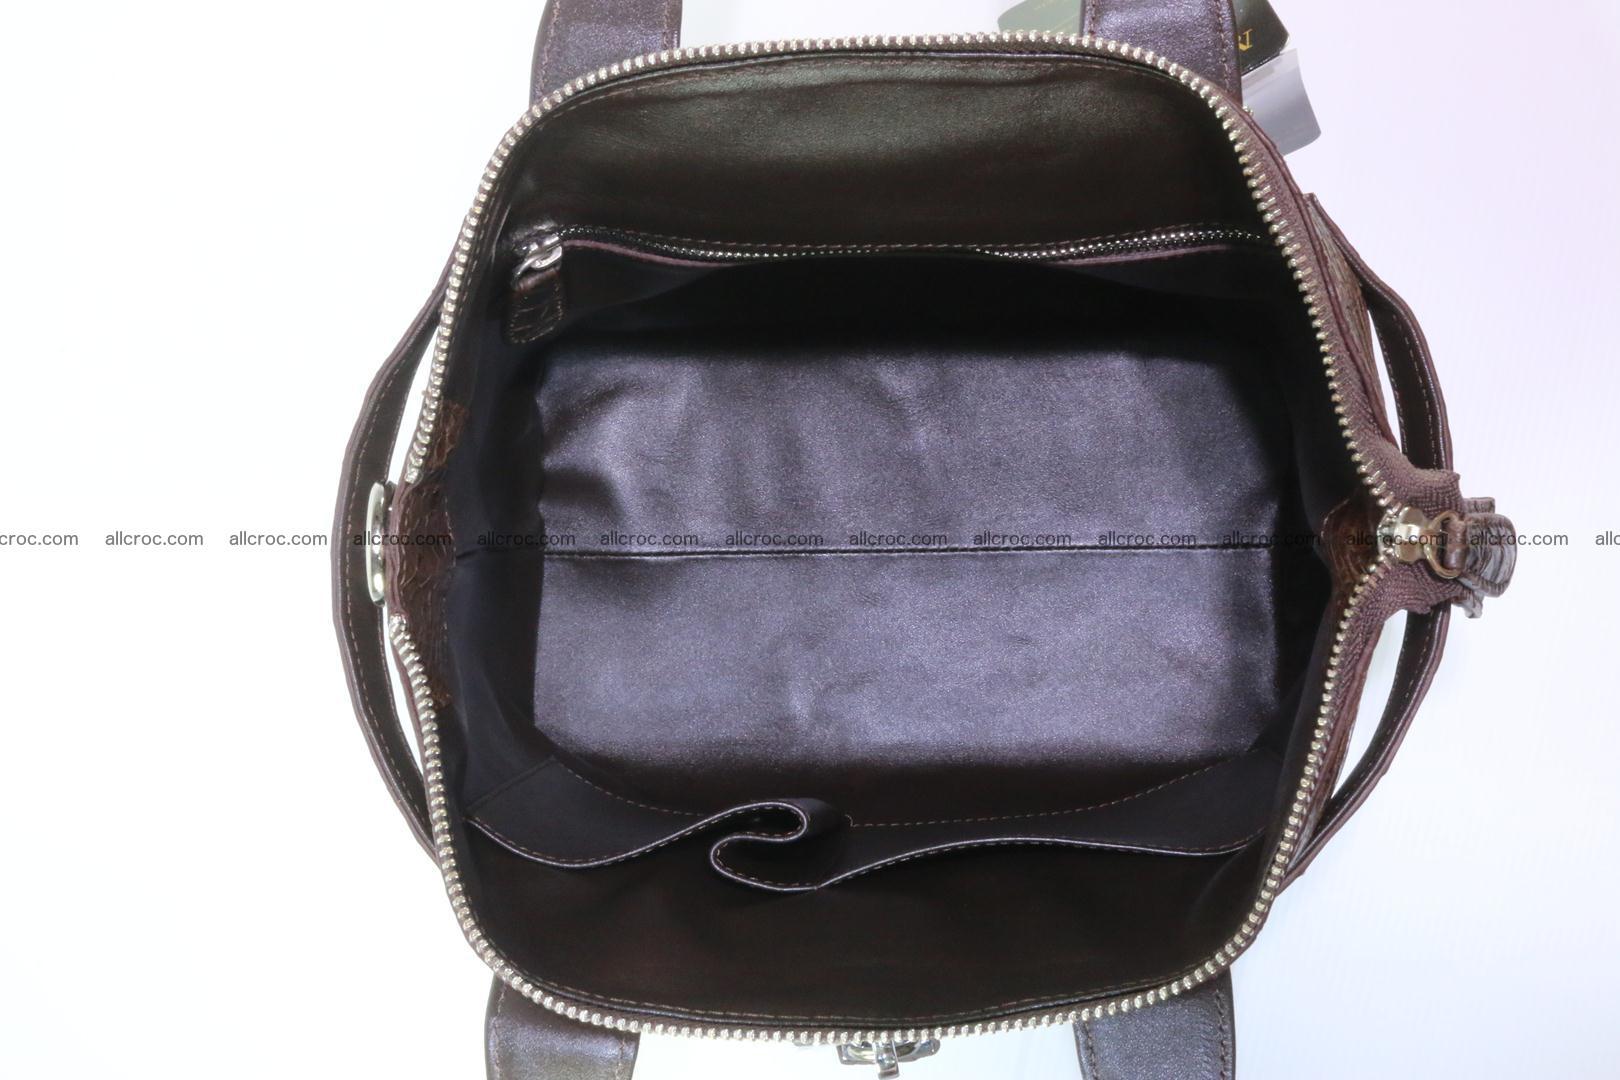 Genuine crocodile handbag for ladies 050 Foto 13